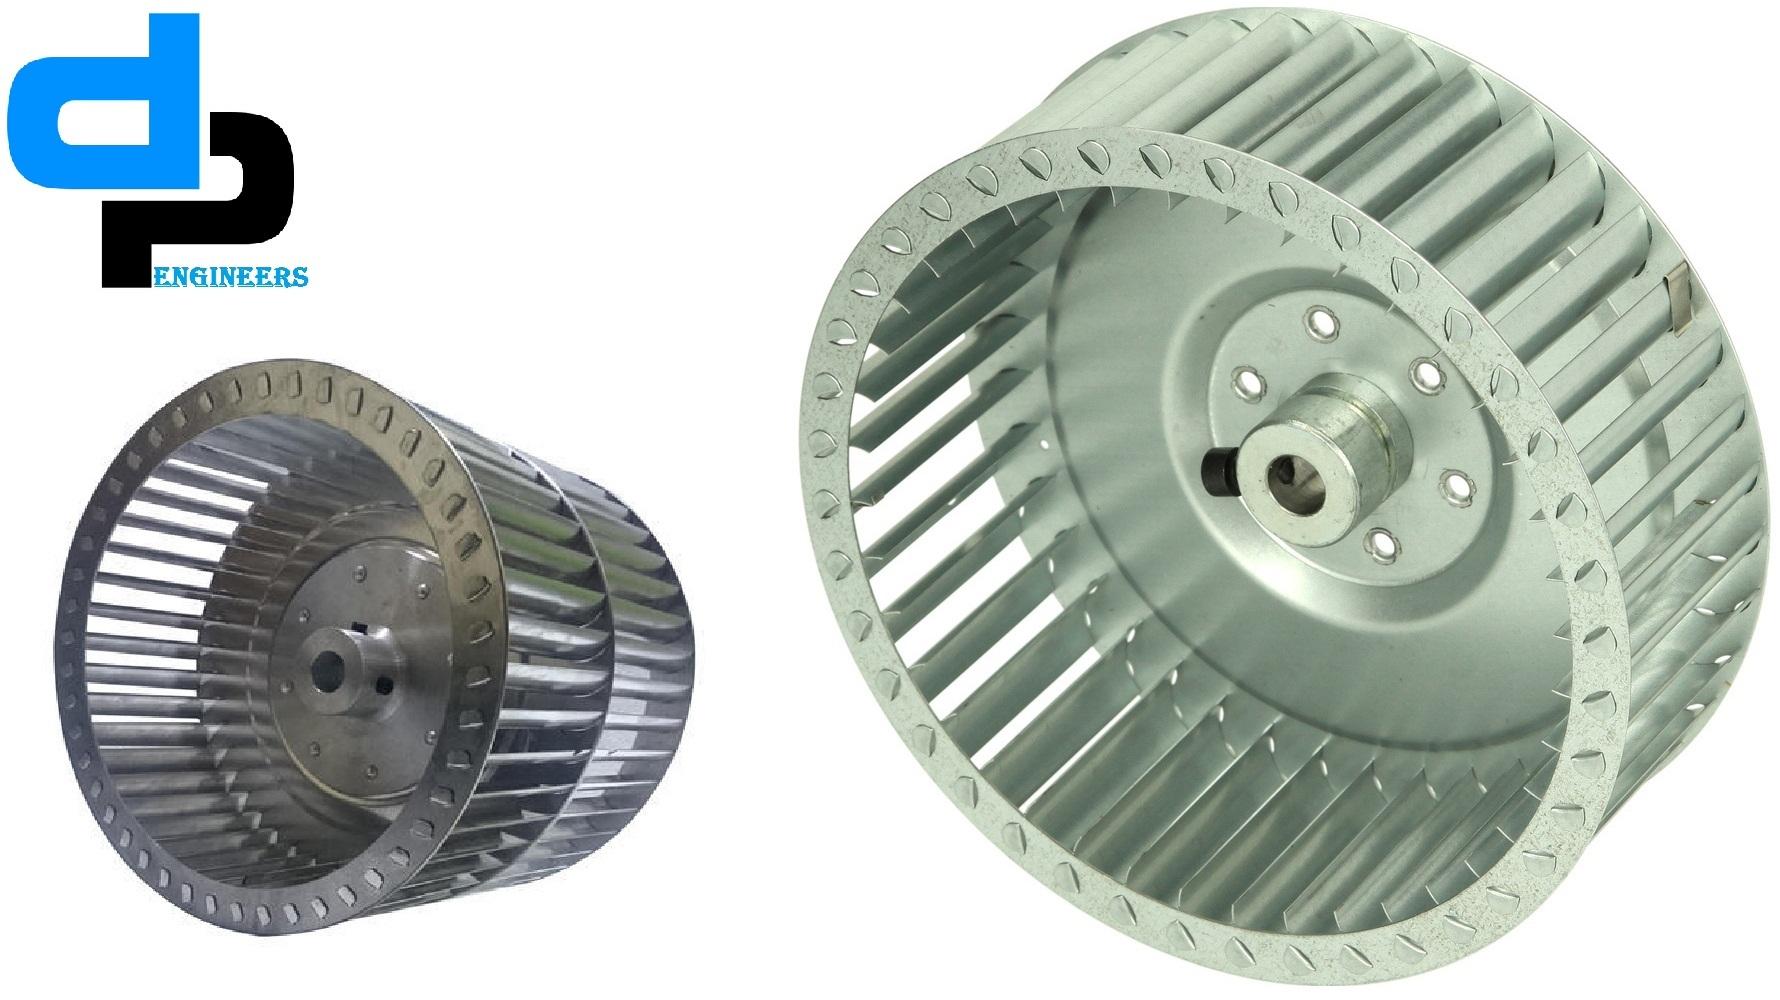 SISW Centrifugal Blower 610 MM X 250 MM